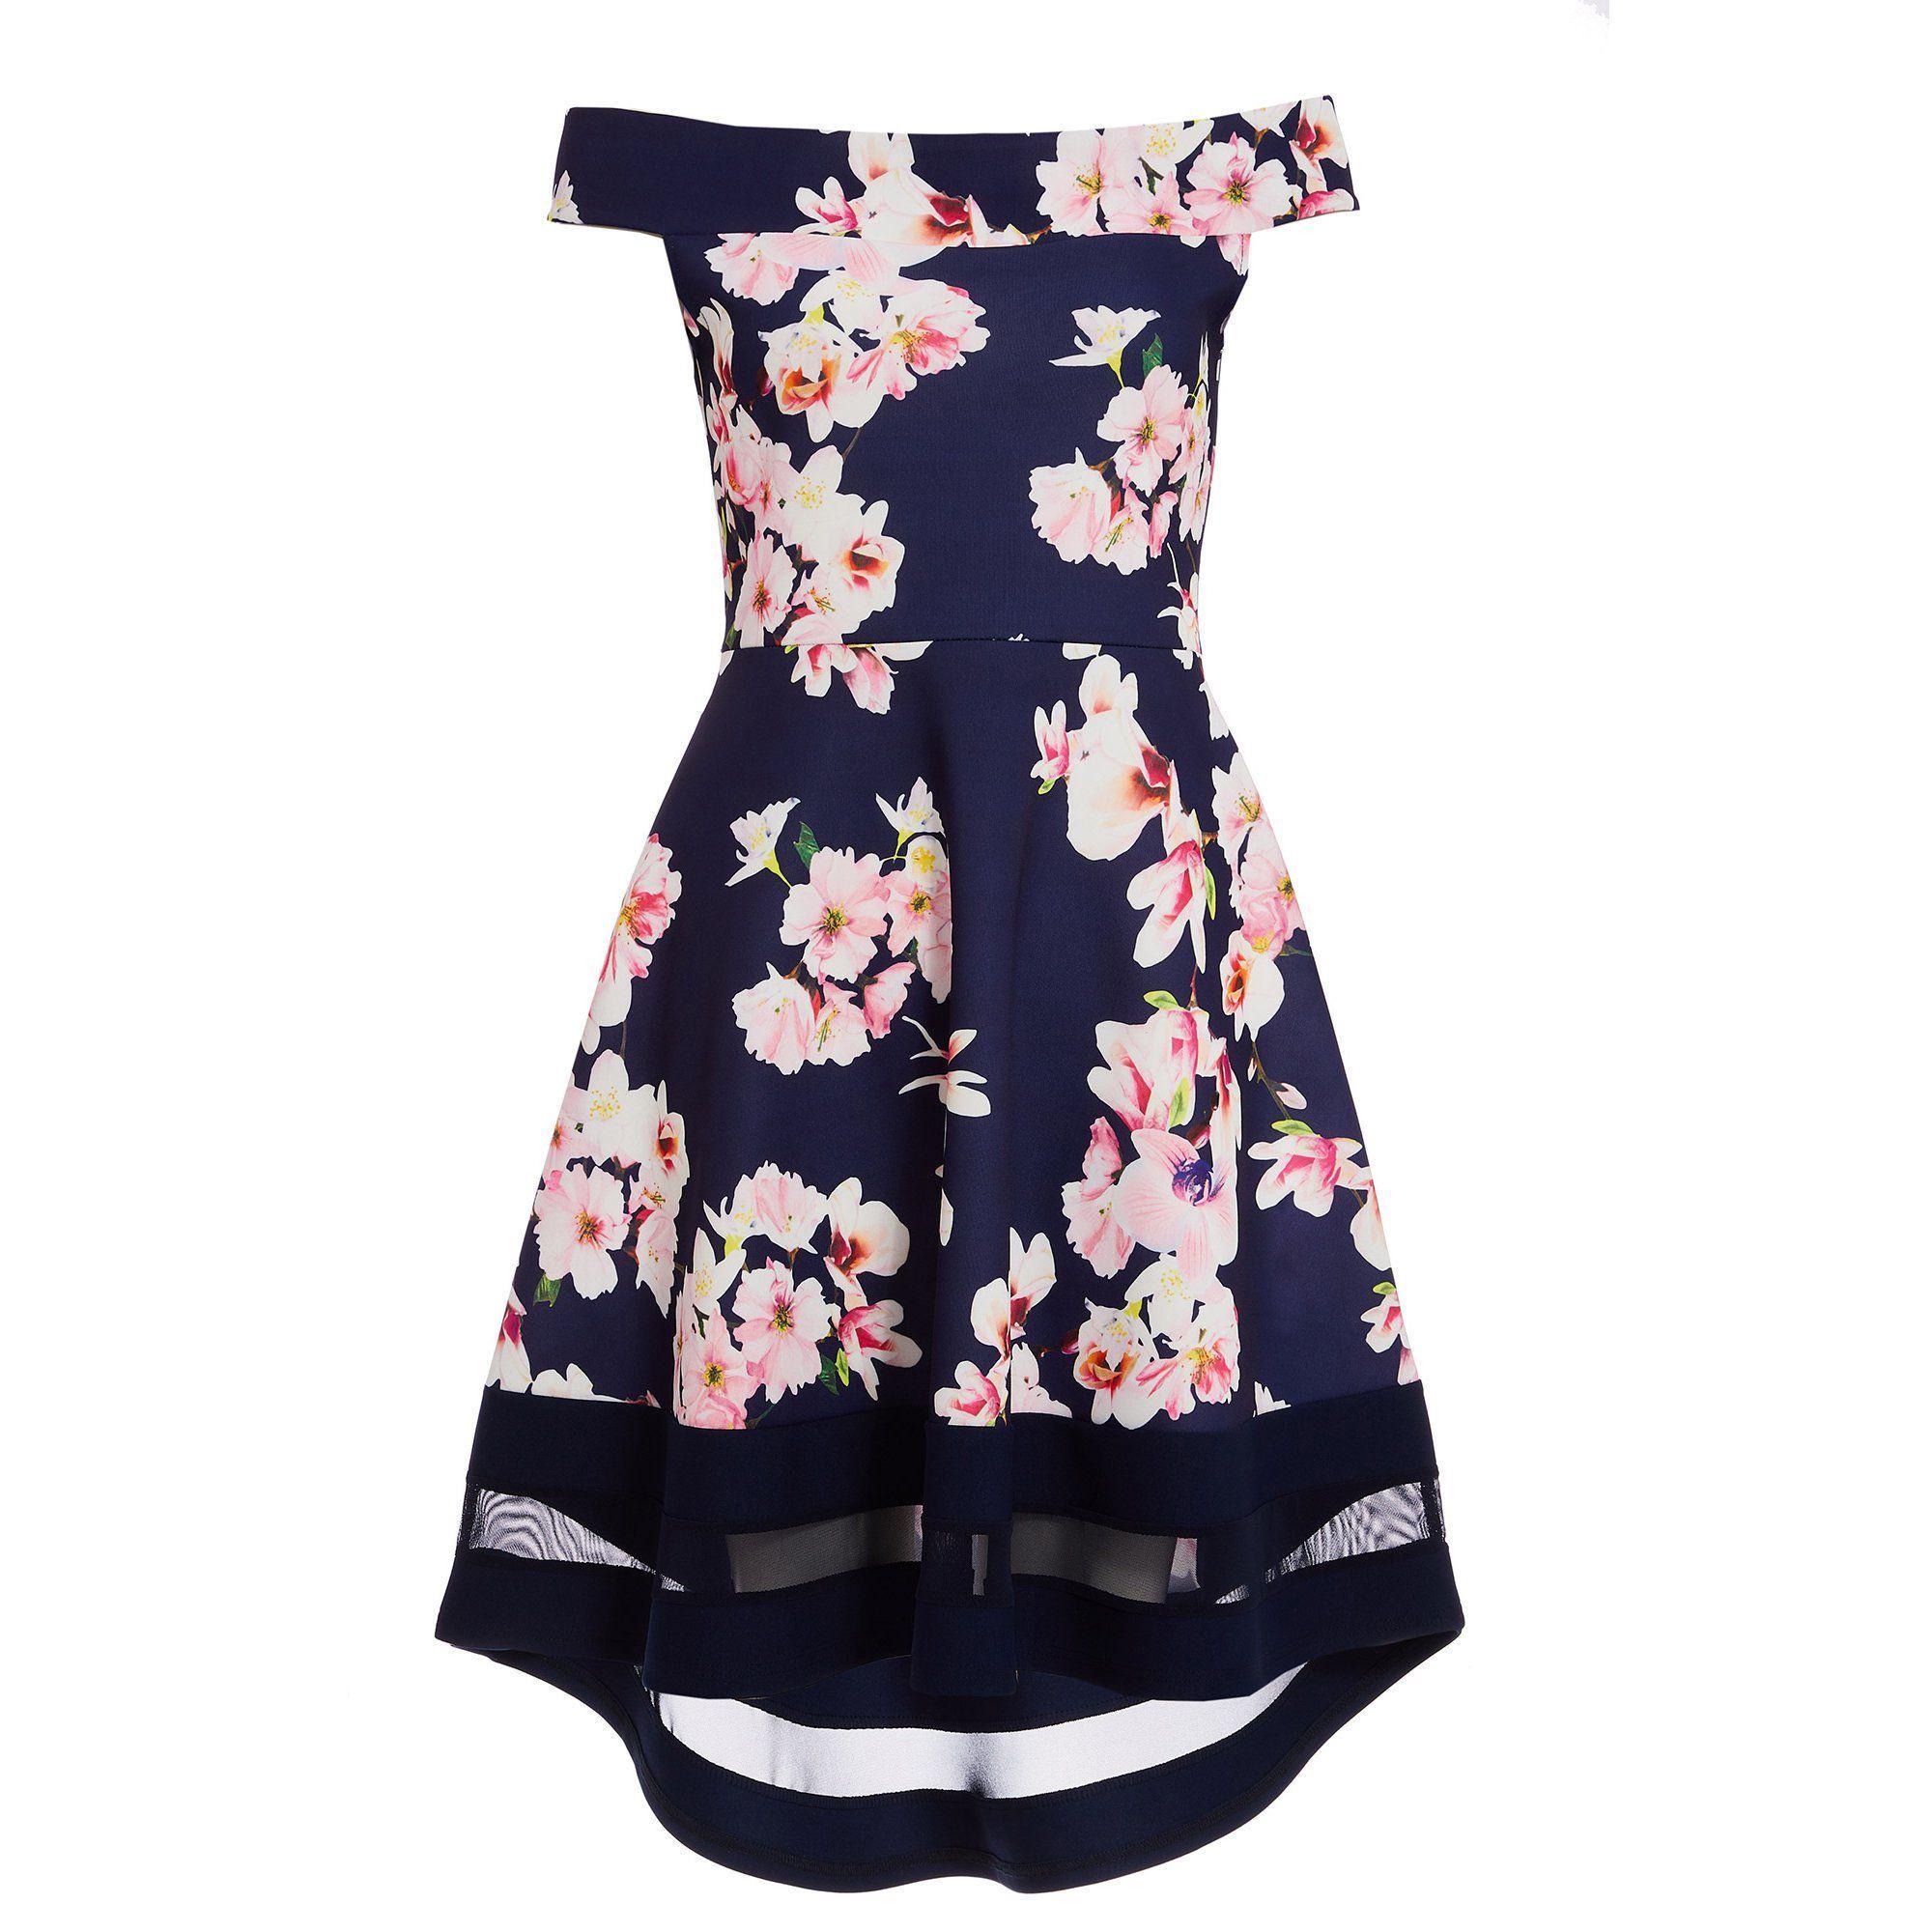 a7f4b8d85095 Quiz Navy Pink And Cream Floral Bardot Dip Hem Dress in Blue - Lyst